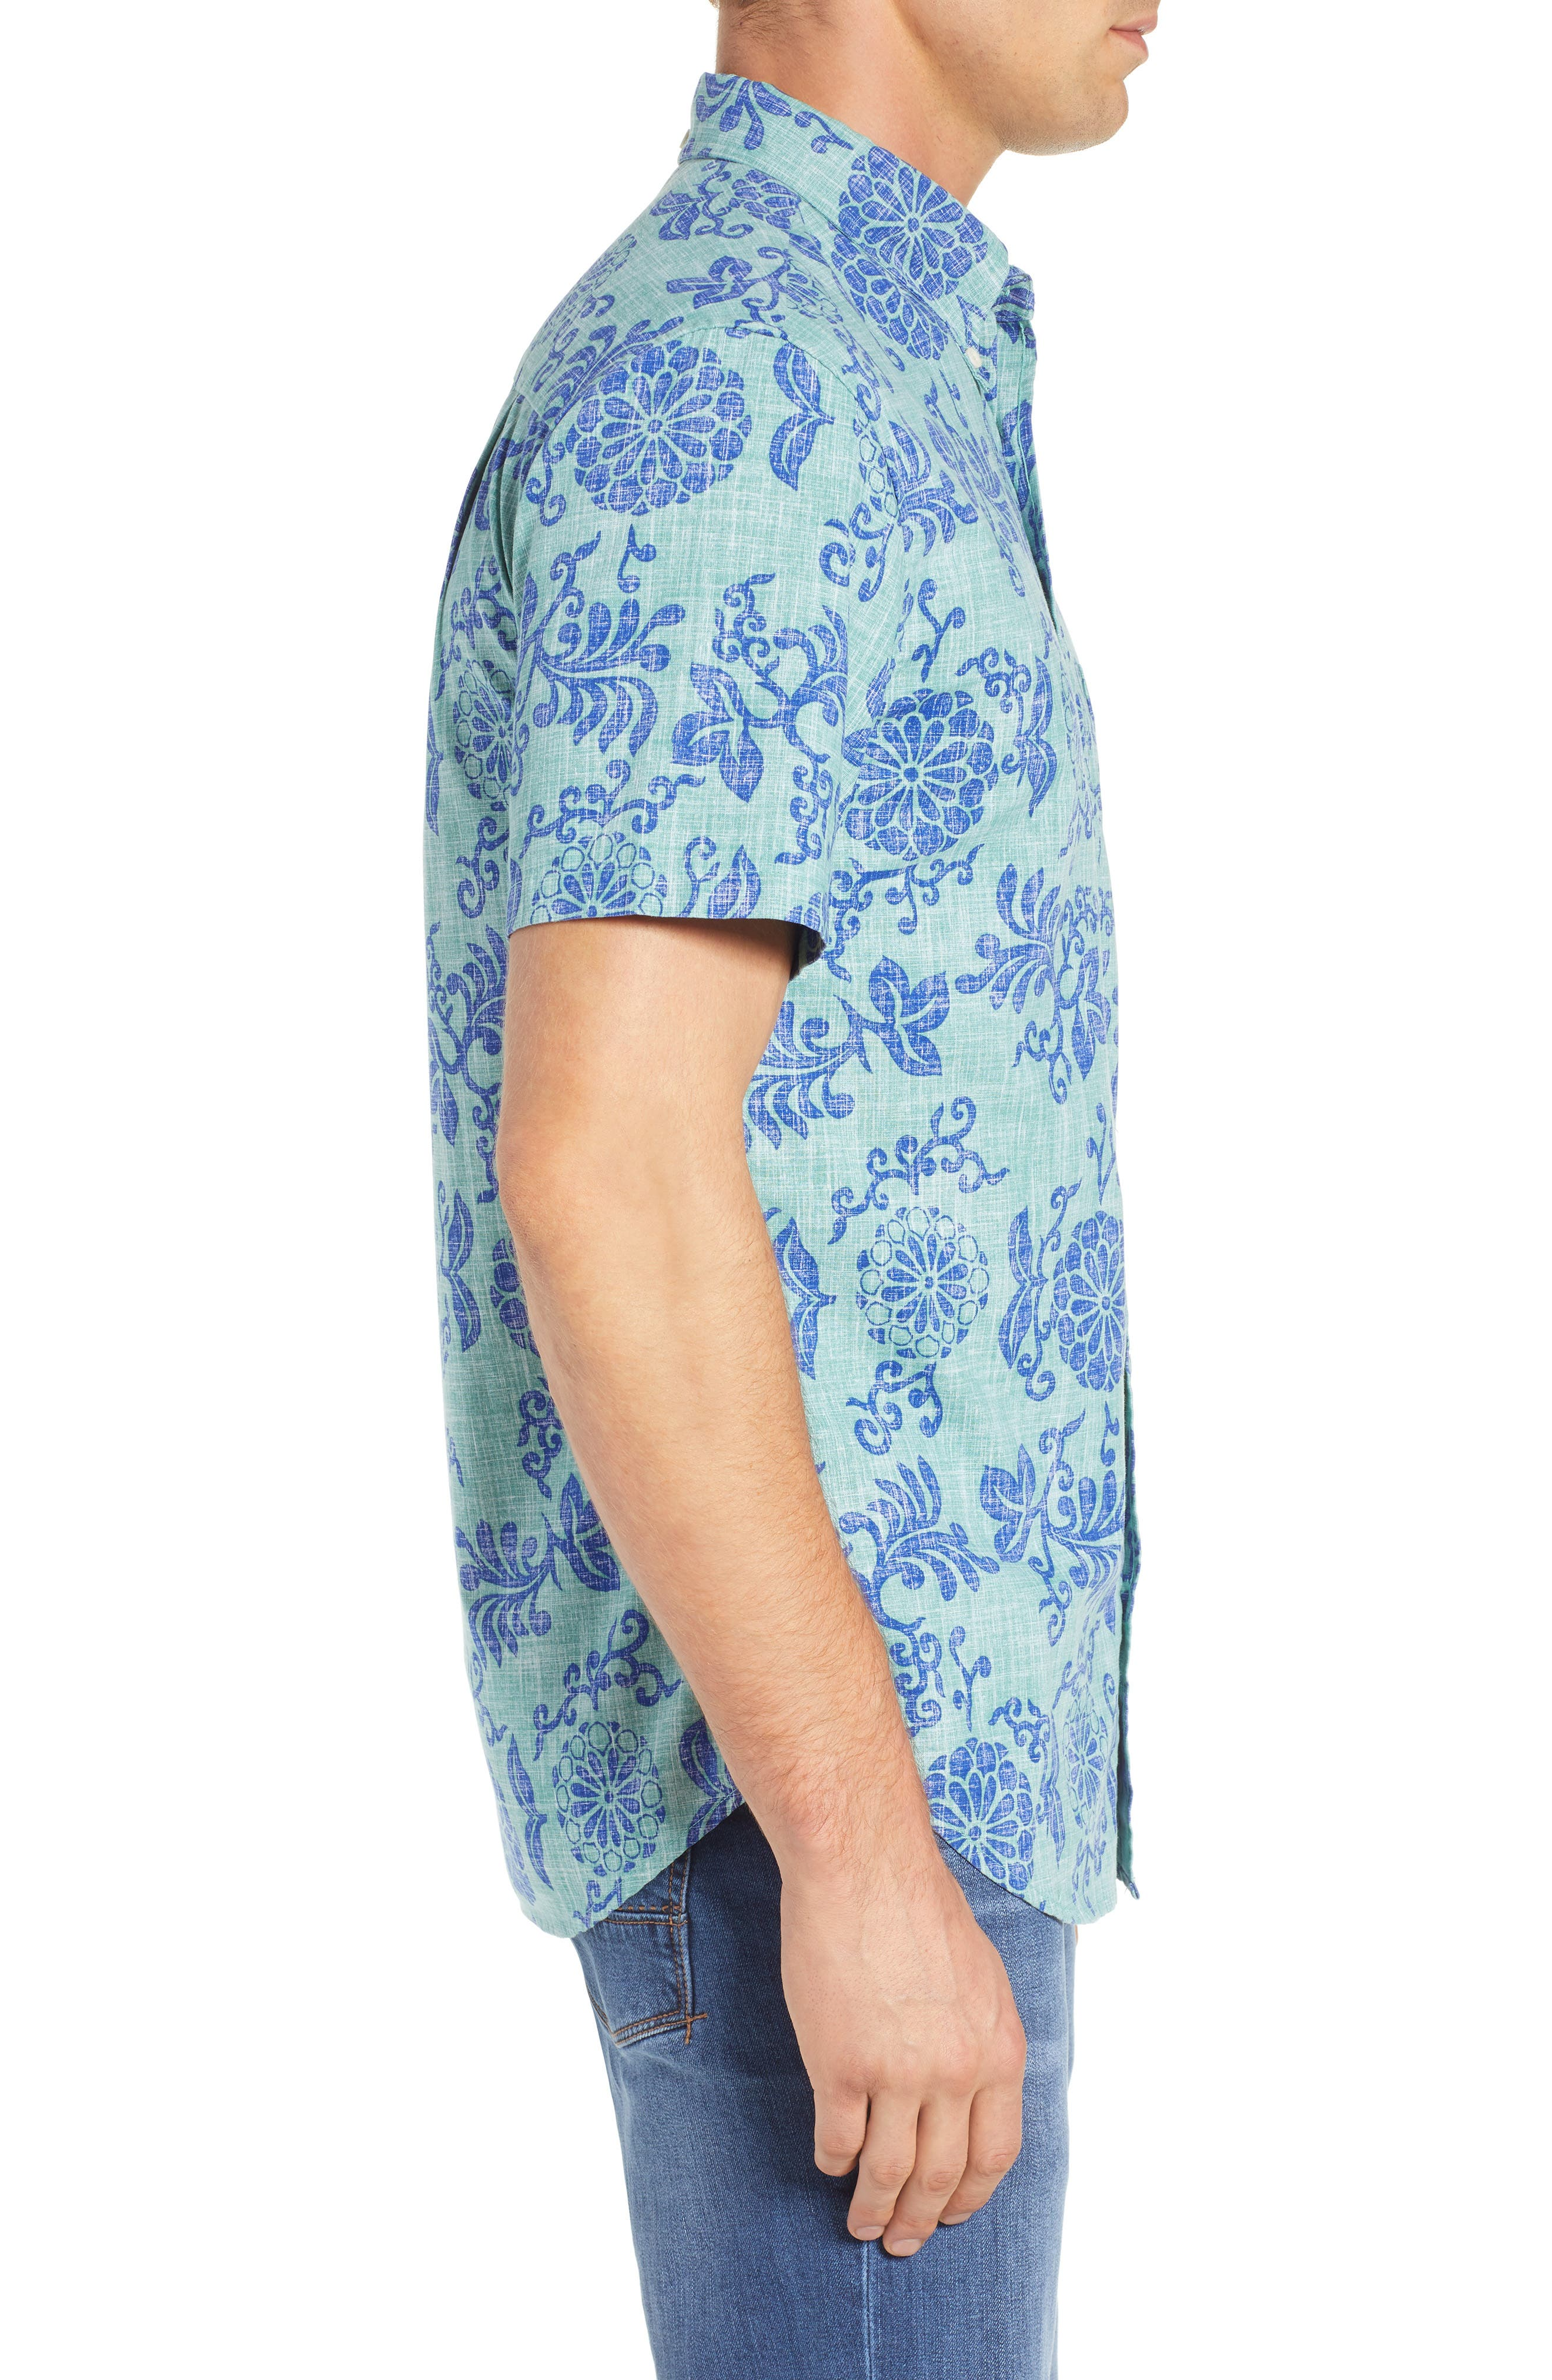 REYN SPOONER, Royal Chrysanthemums Regular Fit Sport Shirt, Alternate thumbnail 4, color, 310